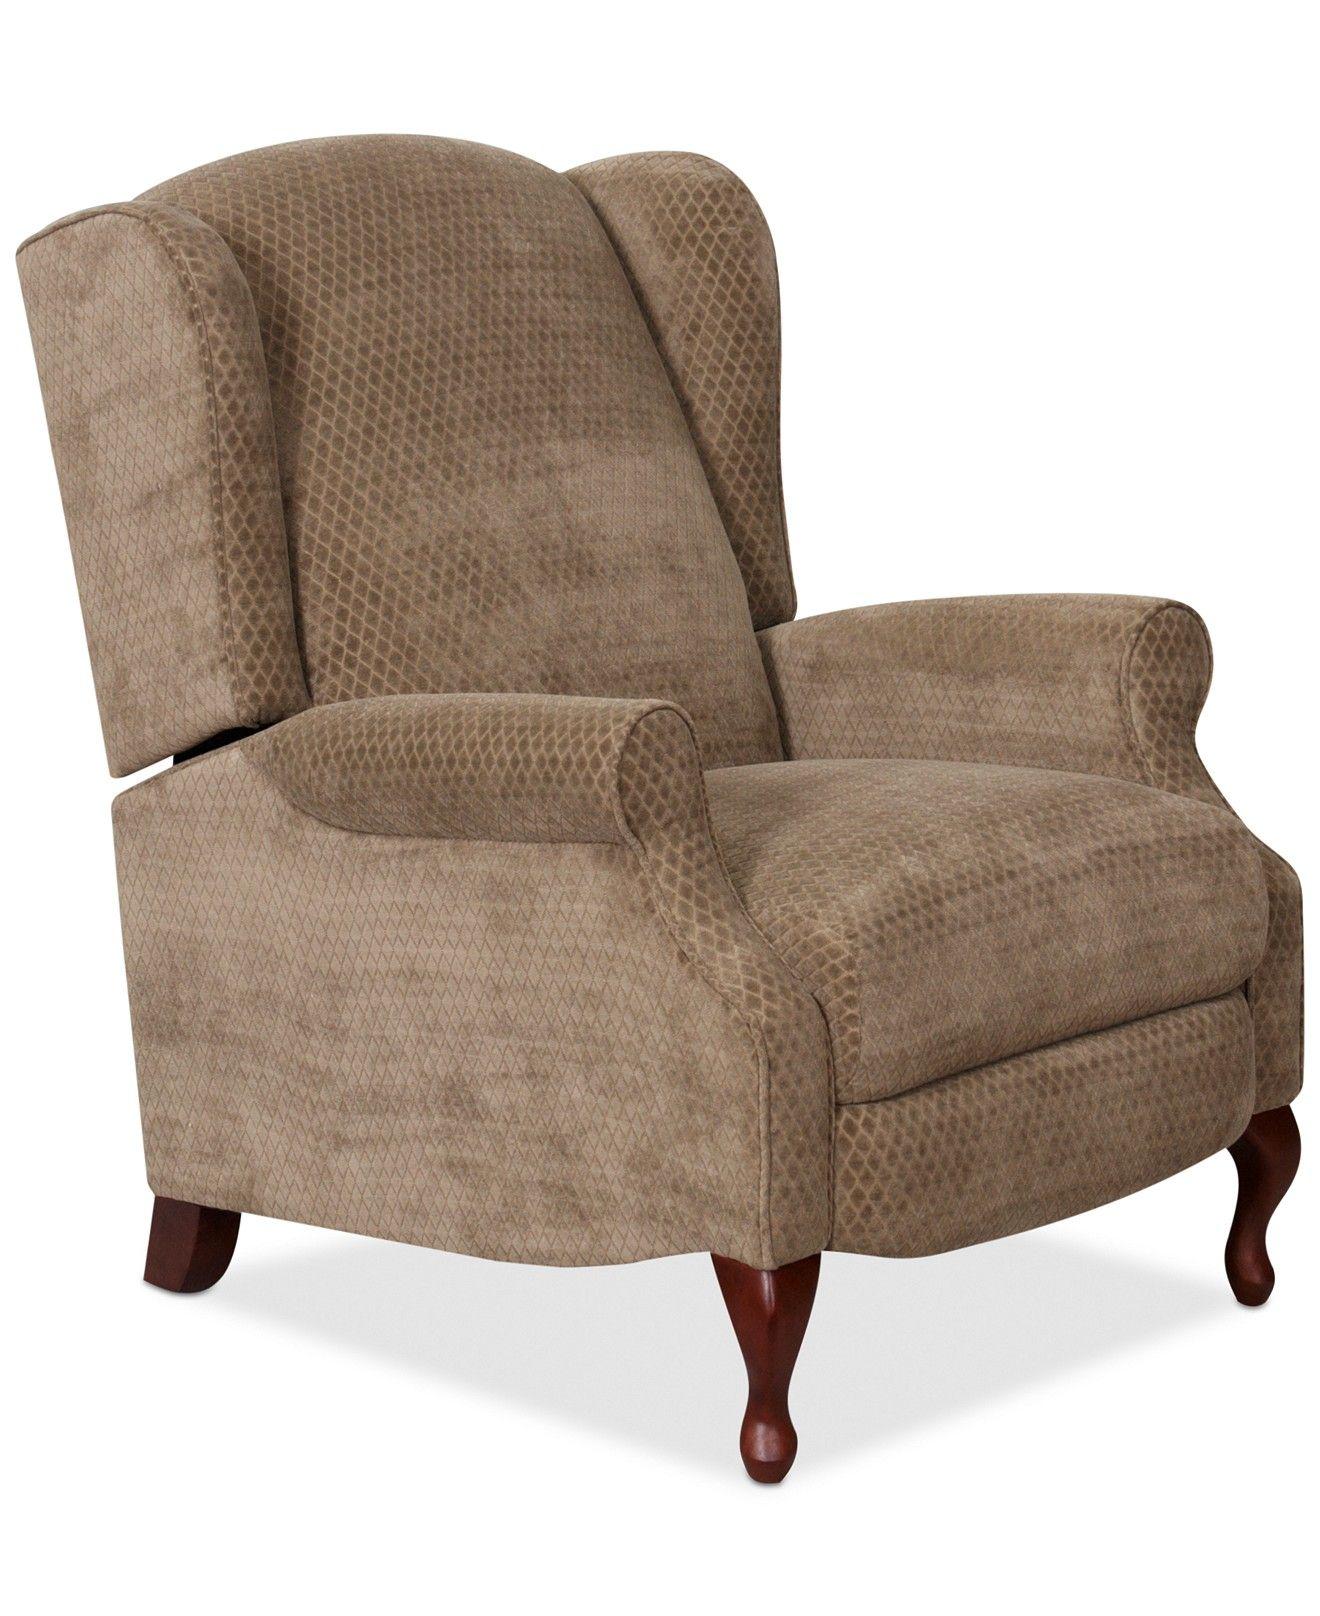 Attrayant Edie Fabric Recliner   Furniture   Macyu0027s In Color Stone $299 In Feb 2015